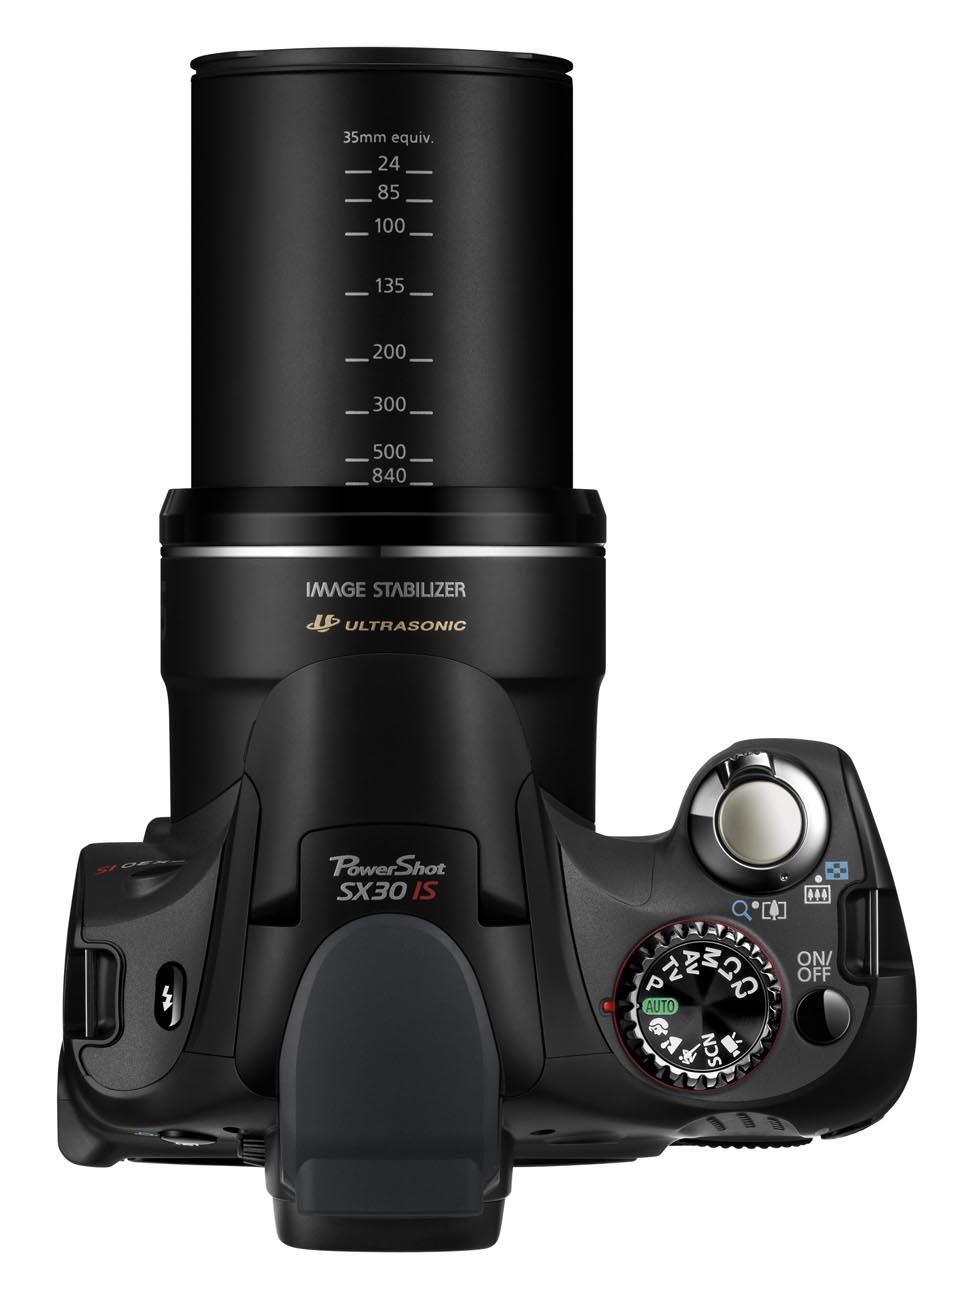 PowerShot SX30 IS TOP LENSEXT